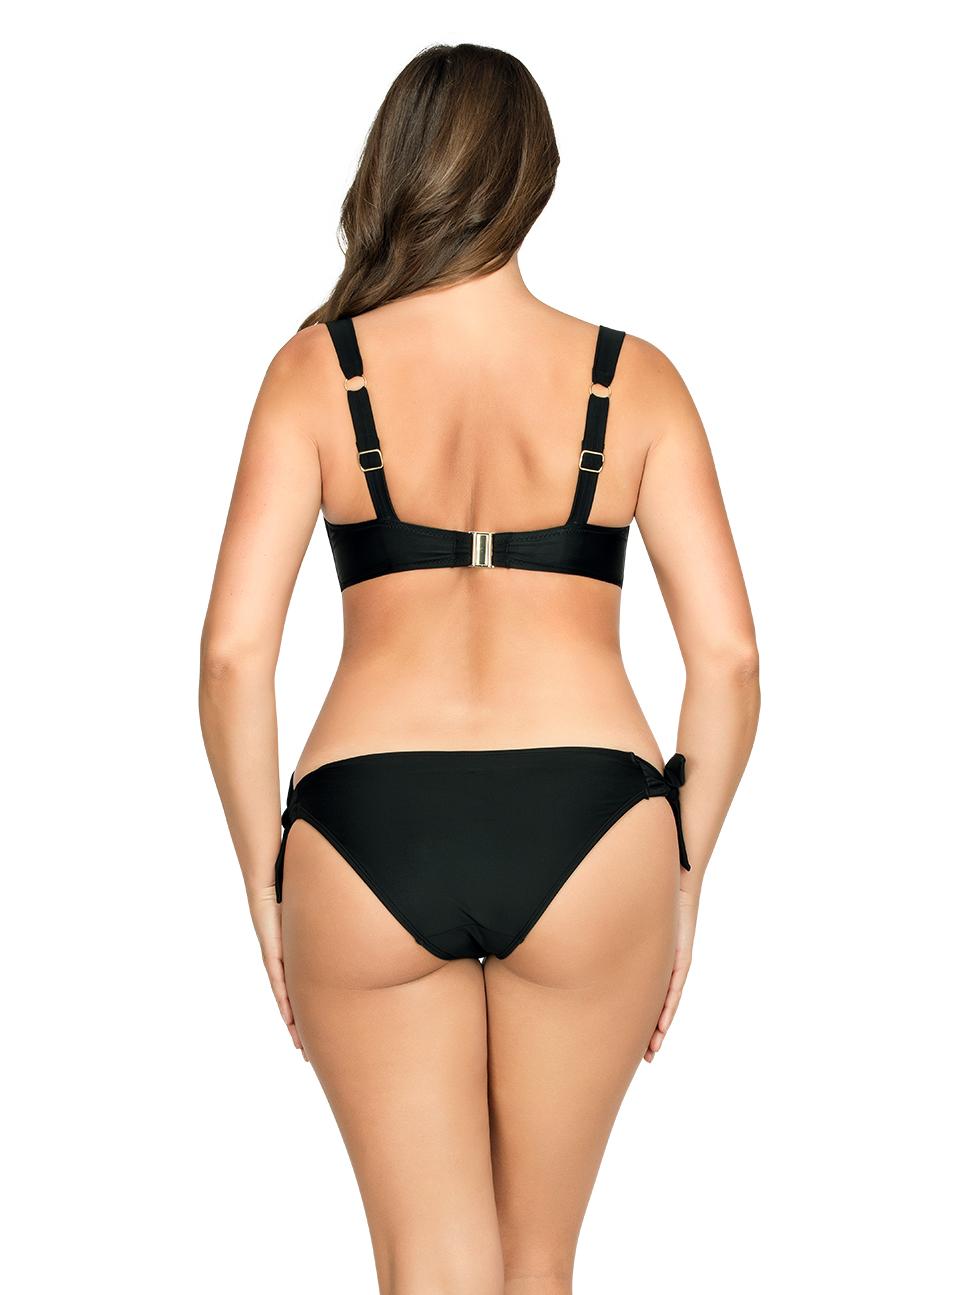 PARFAIT Oceane SoftPaddedBikiniTopS8061 BikiniBottom Black Back - Oceane Bikini Bottom Black S8063